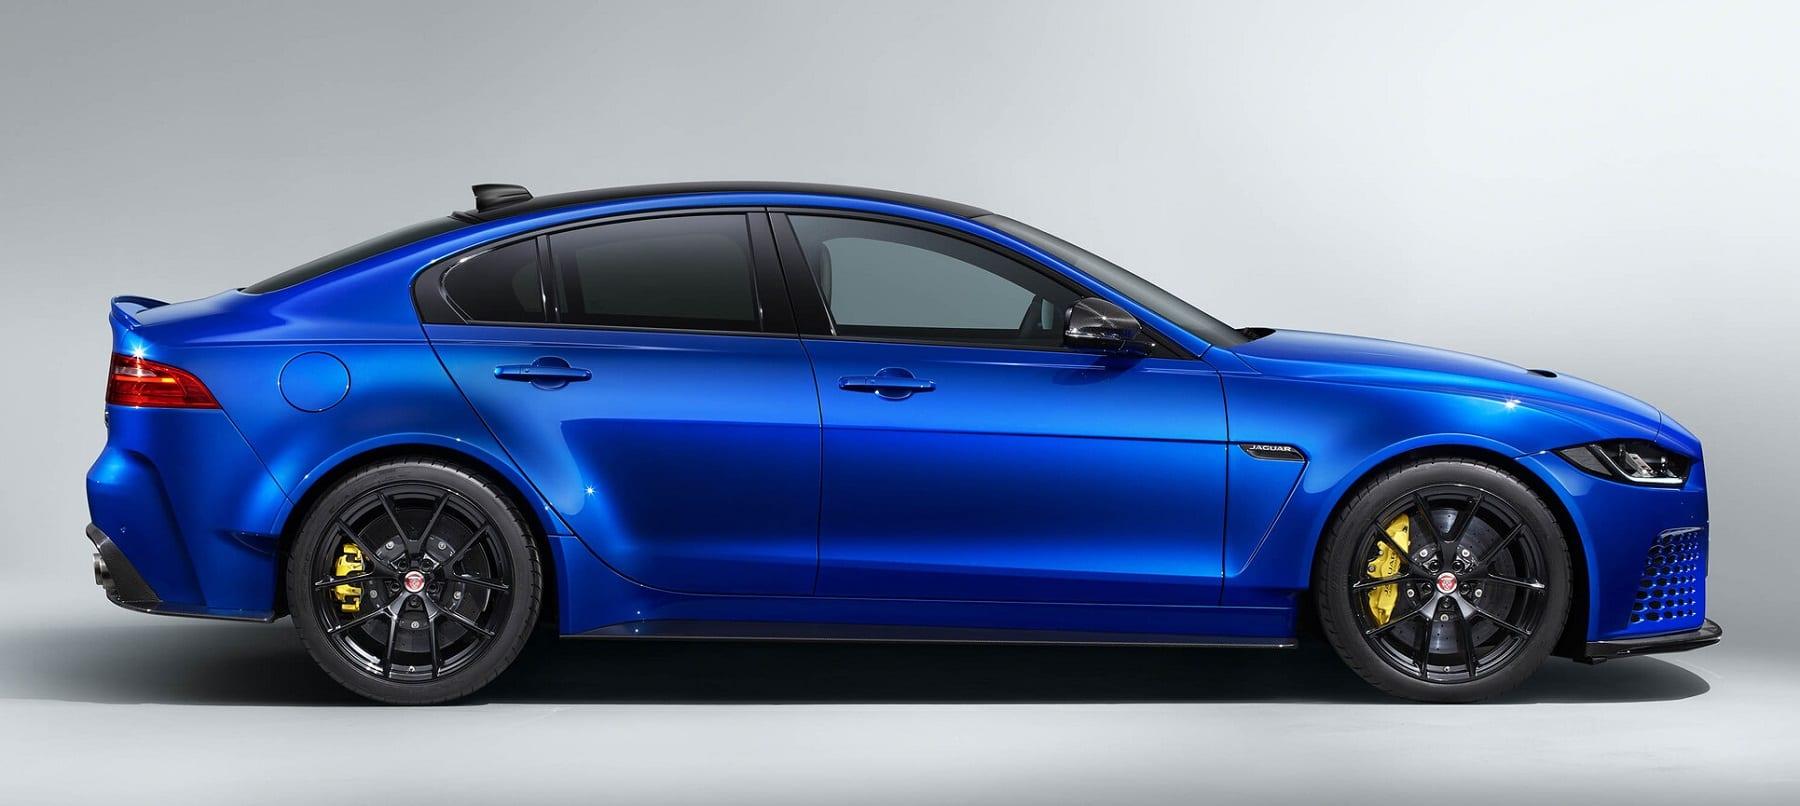 jaguar-xe-sv-project-8-touring-1